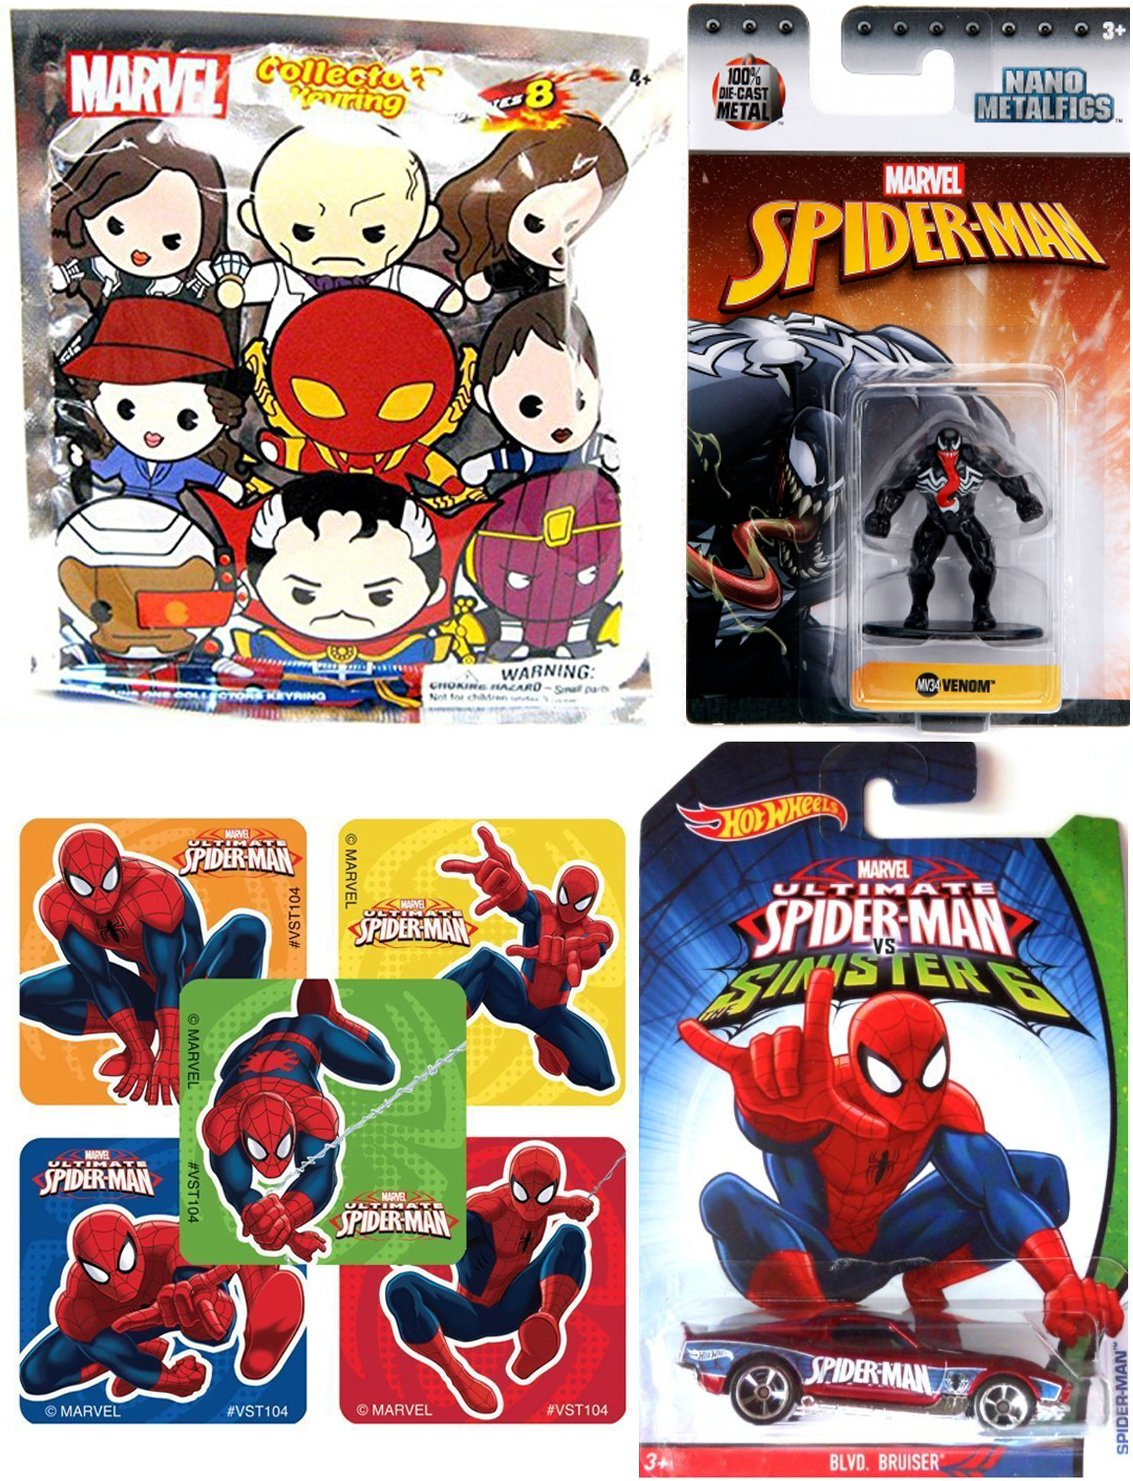 Ultimate Spider-Man Sinister 6 Hot Wheels Car /& Venom Mini Figure Die-Cast Metal NanoFig with Marvel Blind Bag Key Ring /& Bonus Stickers HWAYB